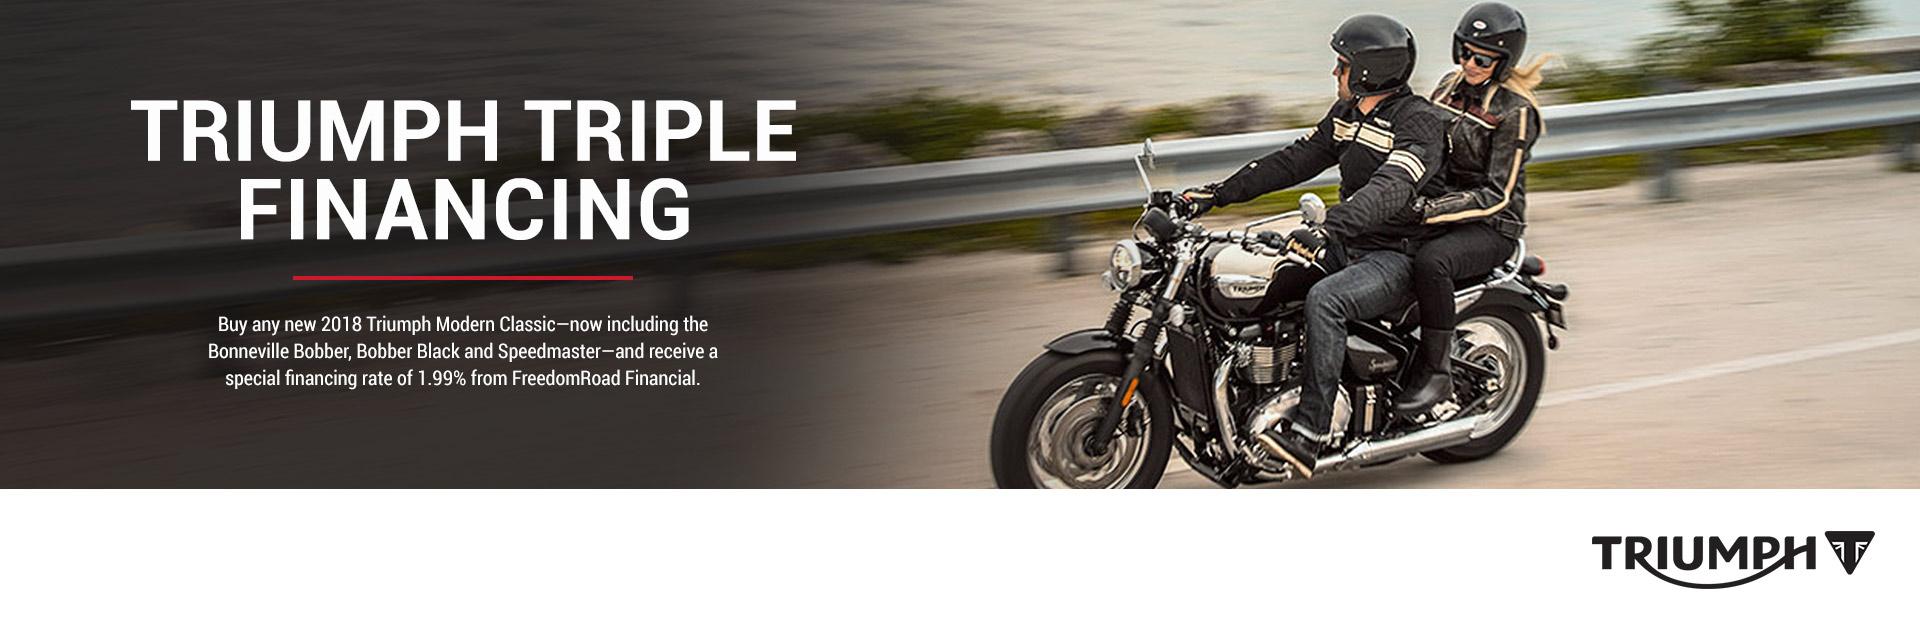 Triumph: Triumph Triple Financing